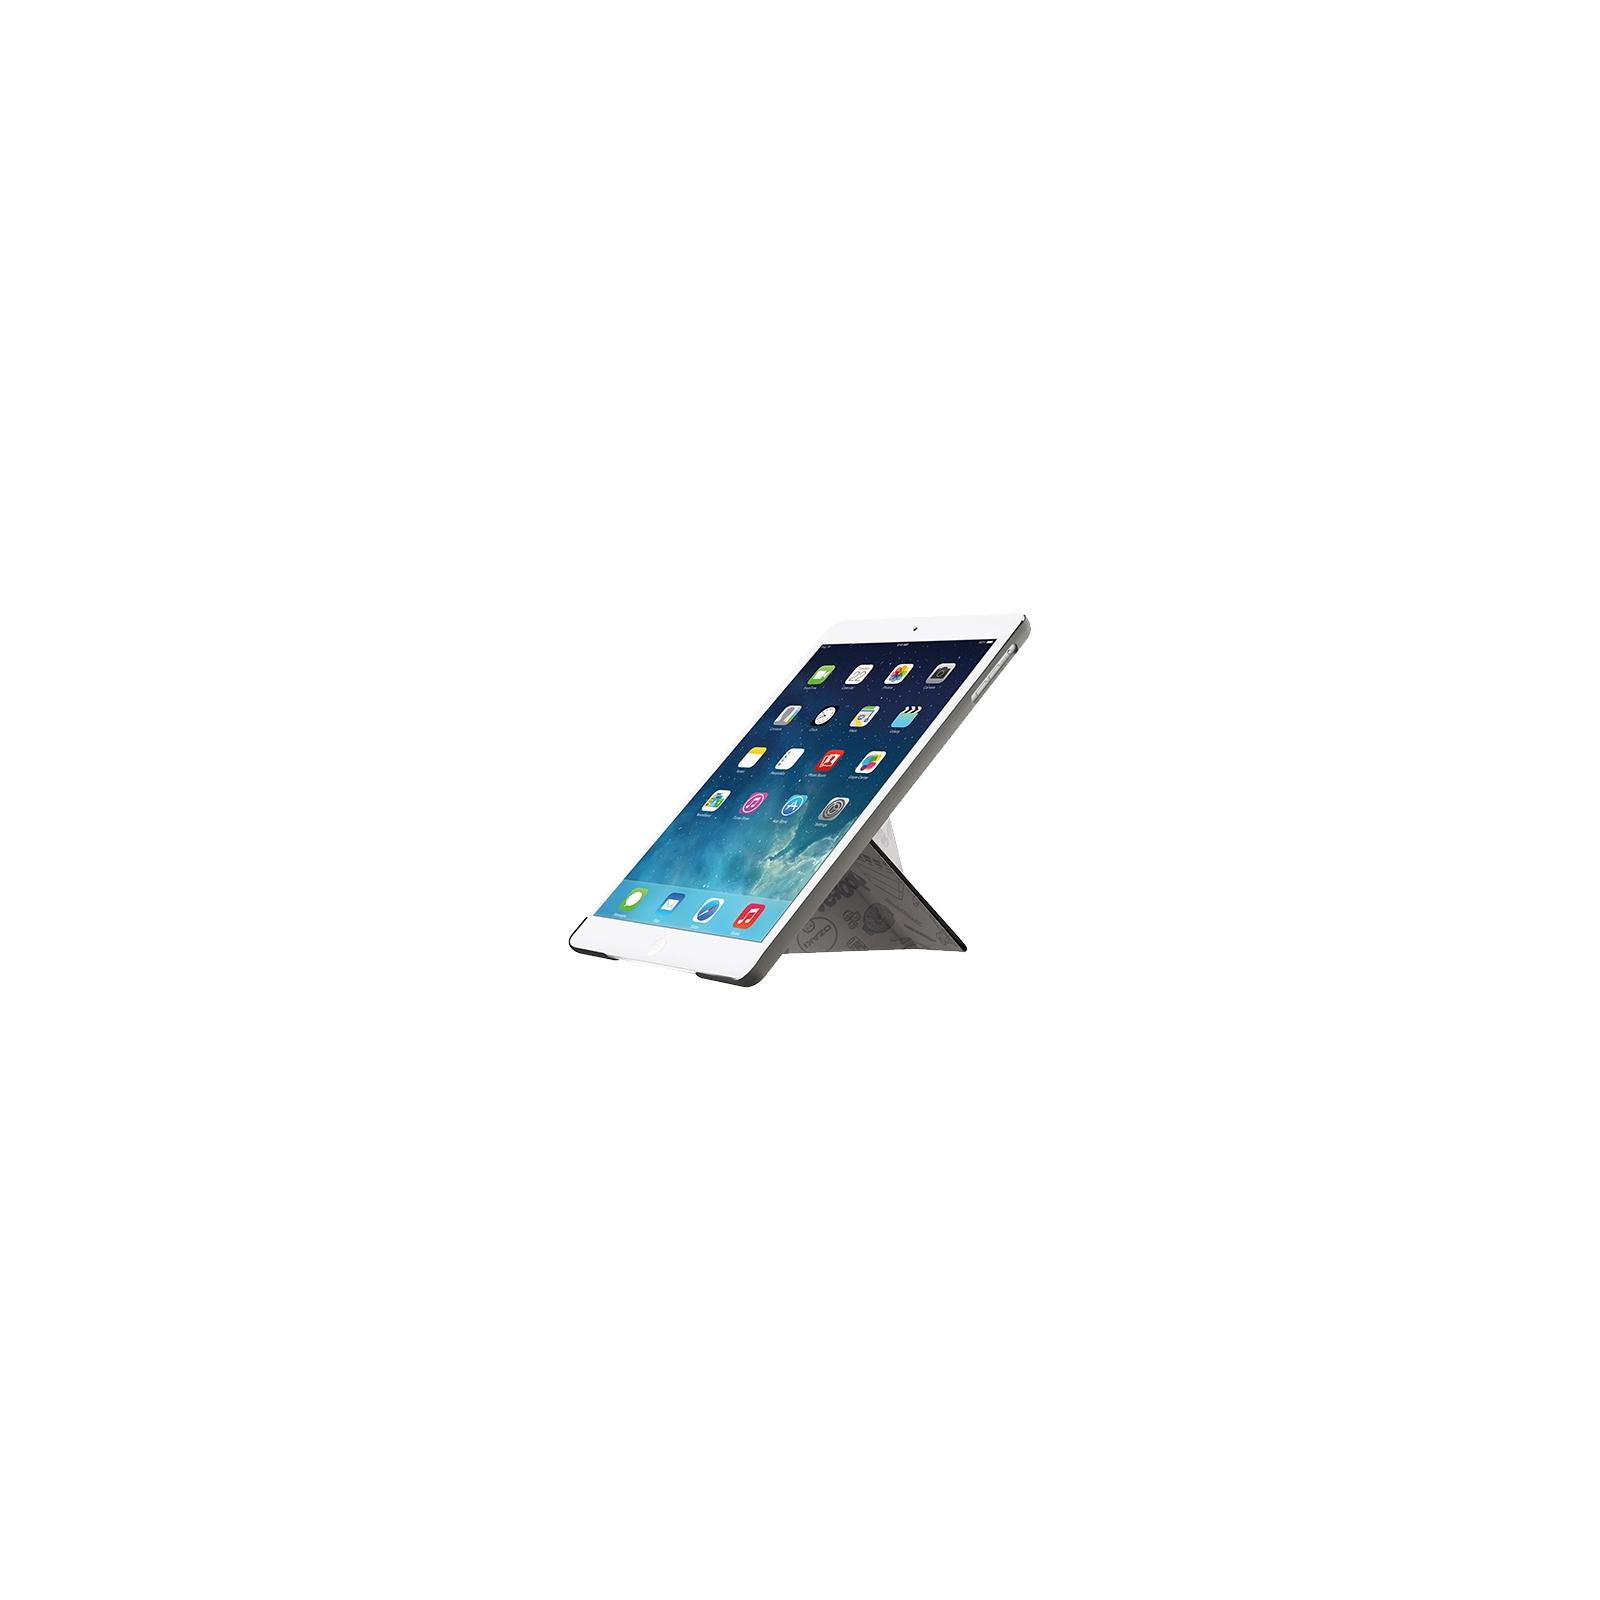 Чехол для планшета OZAKI iPad Air O!coat Travel 360° Multiangle (OC111SO) изображение 2